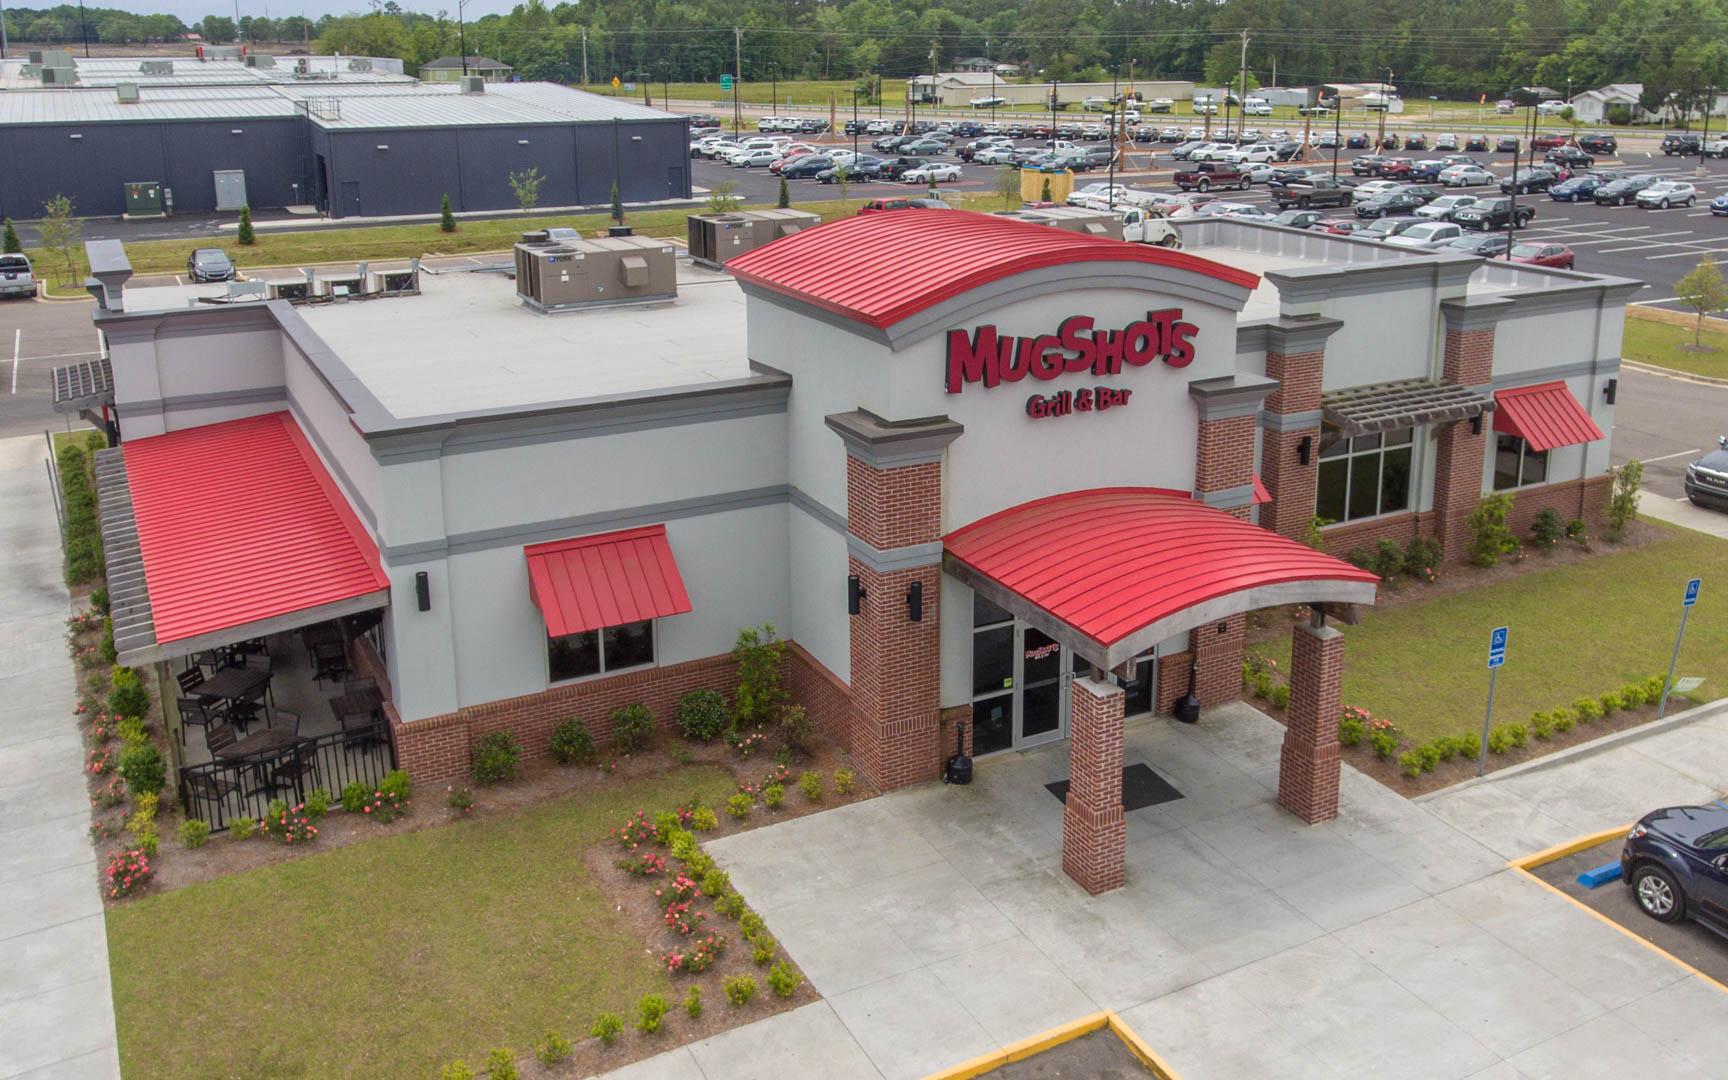 D'Iverville, MS — Mugshots Grill & Bar